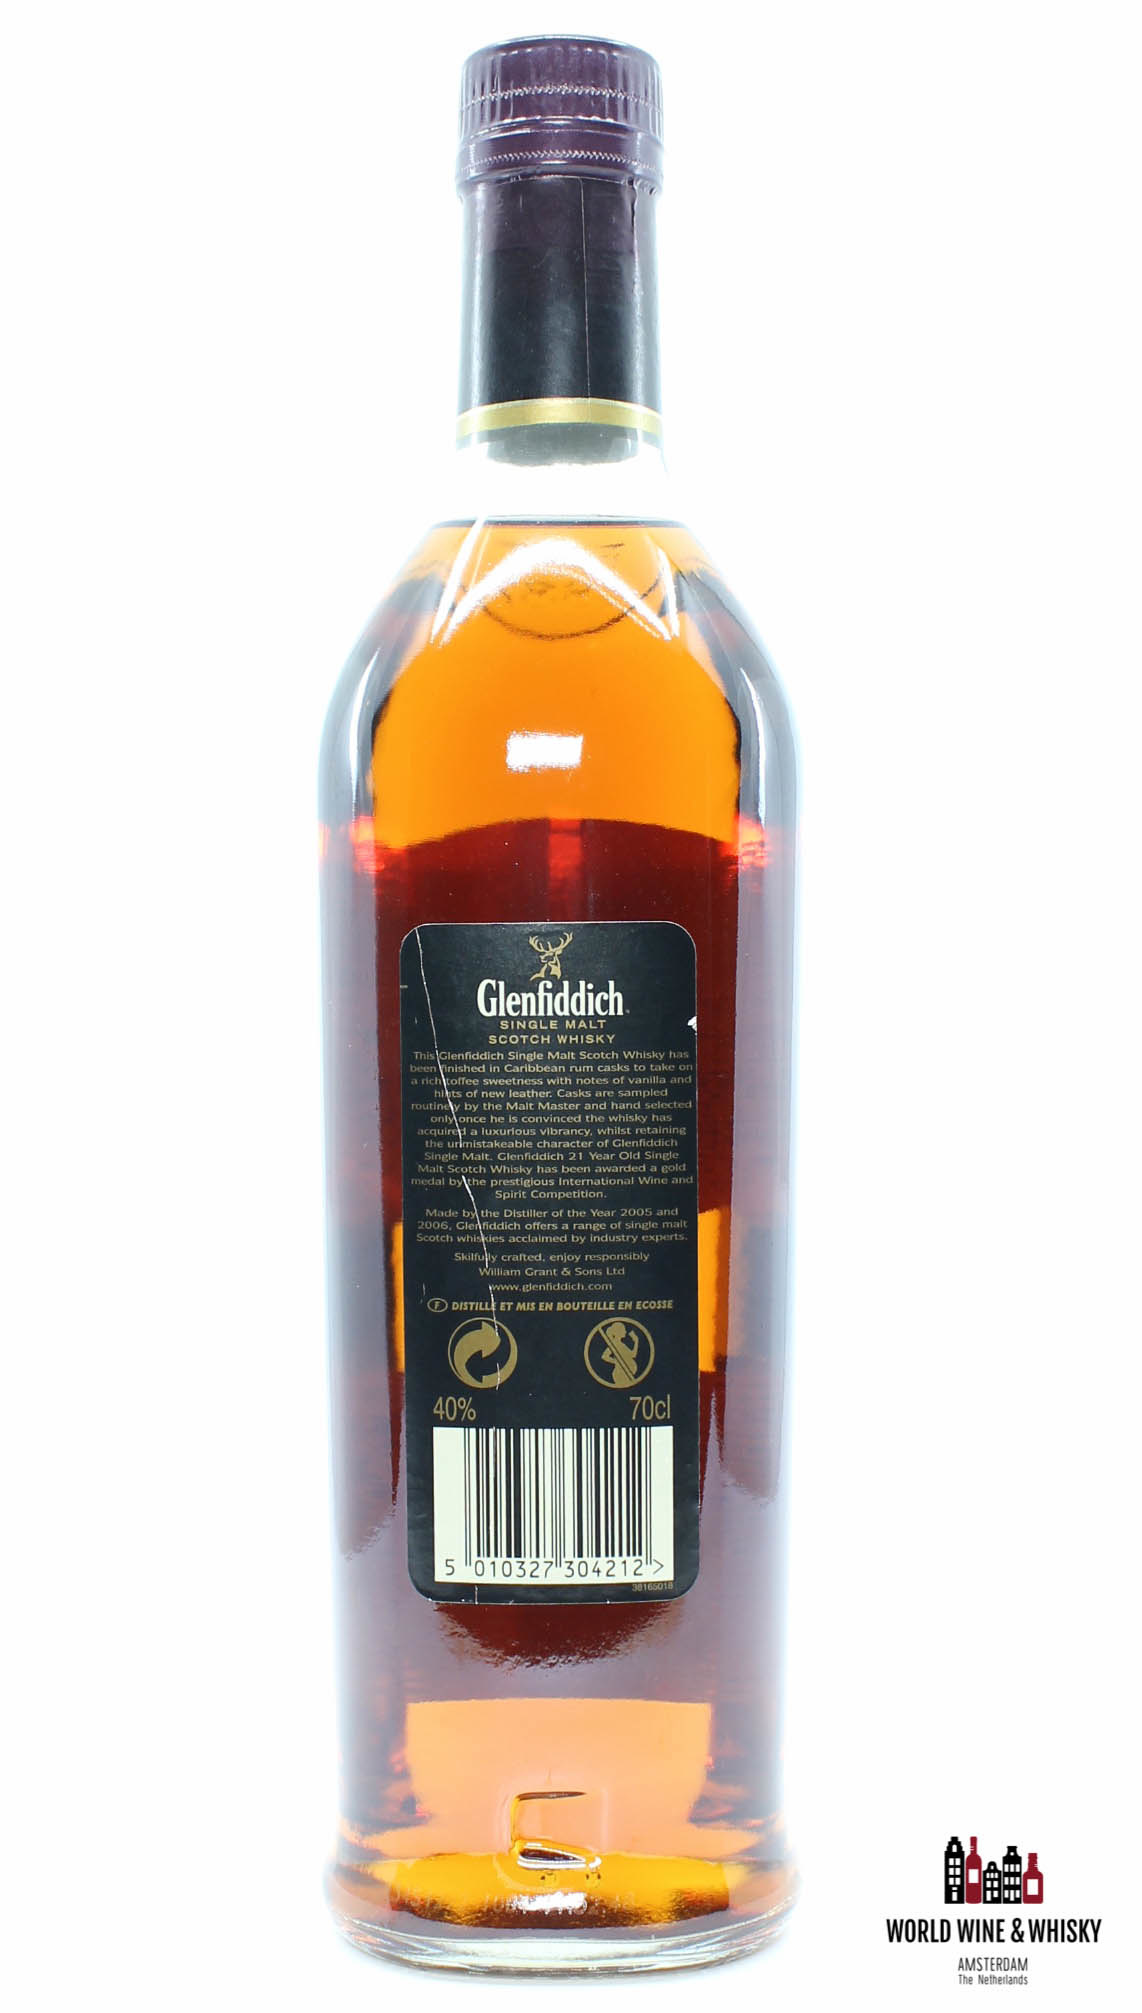 Glenfiddich Glenfiddich 21 Years Old - Caribbean Rum - Cask Selection 22 40% 700ml